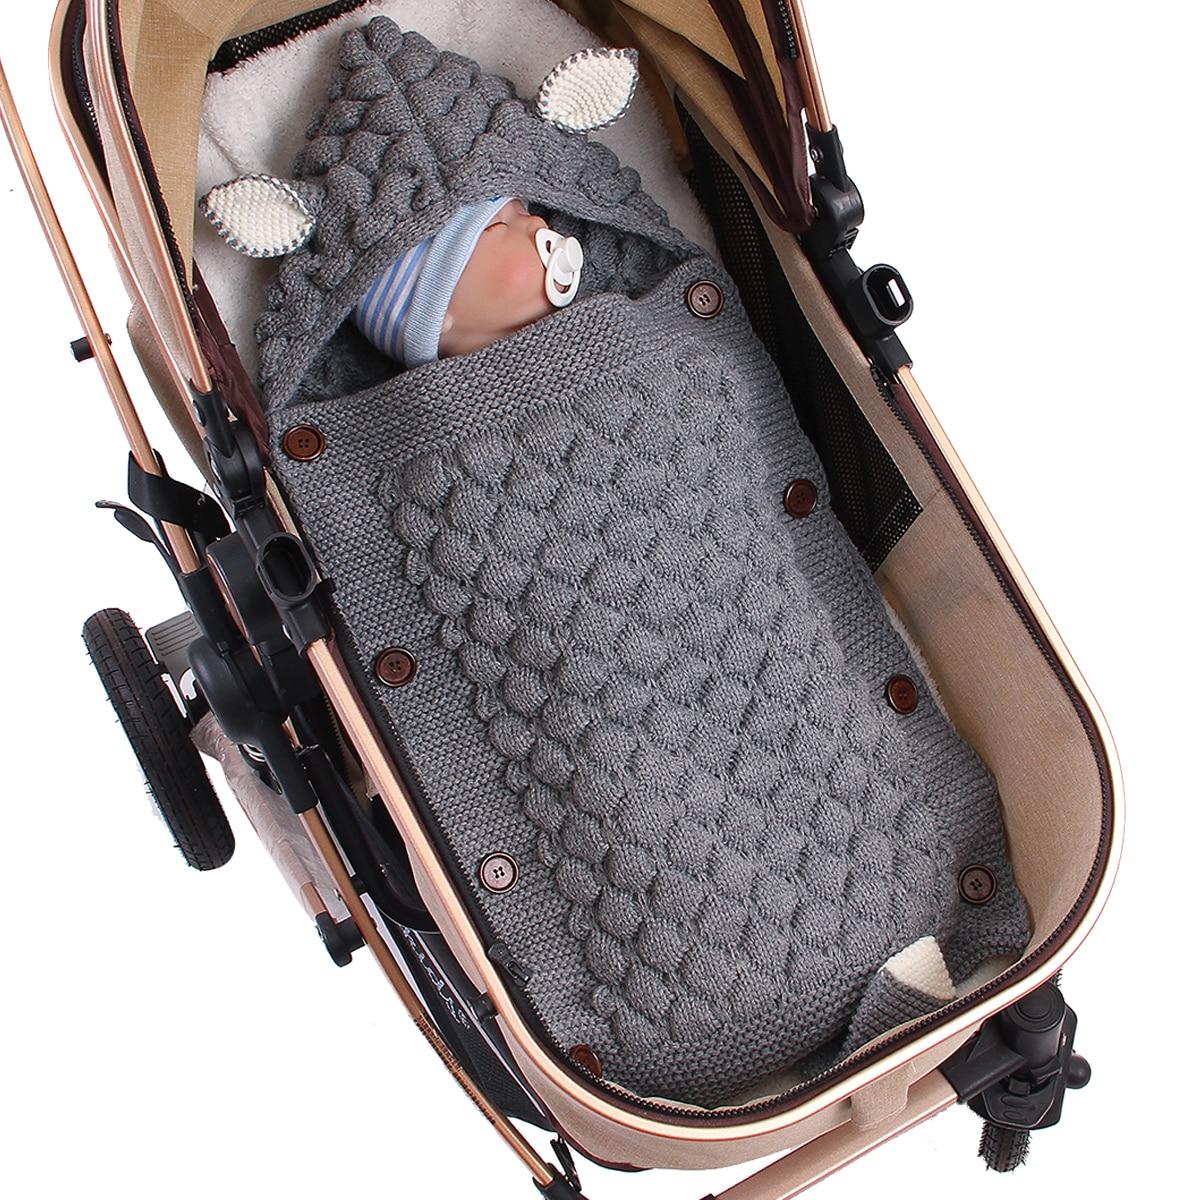 Baby Woolen Swaddle Wrap Blanket Envelope For Newborn Infant Girls Boys Knit Crochet Winter Sweater Sleeping Bag Sack Puseky